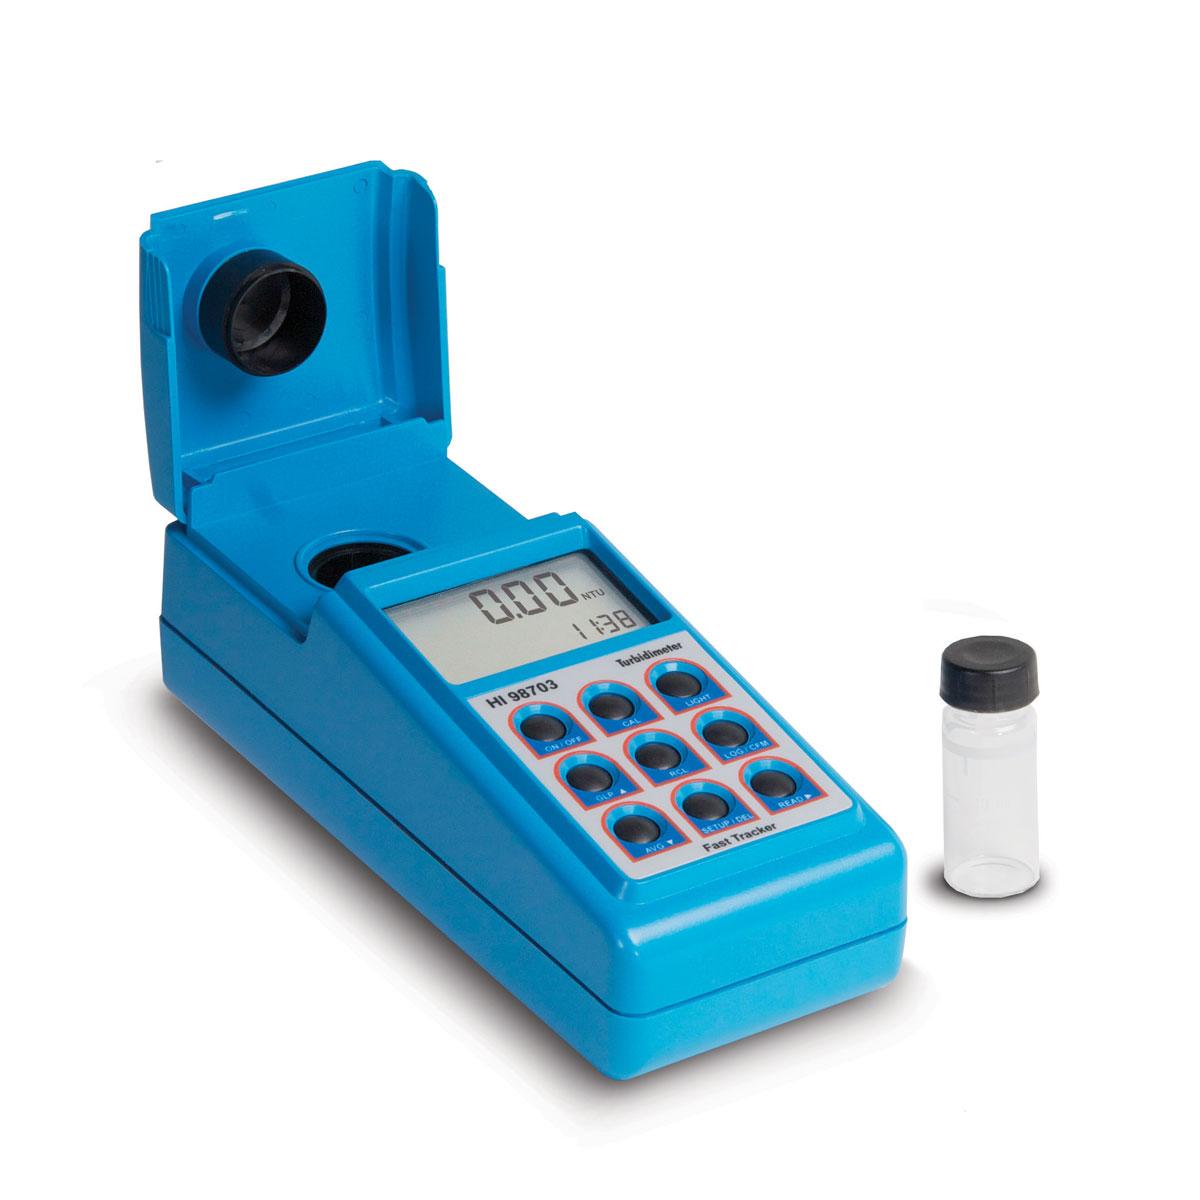 HI98703 - Turbidimetro portatile